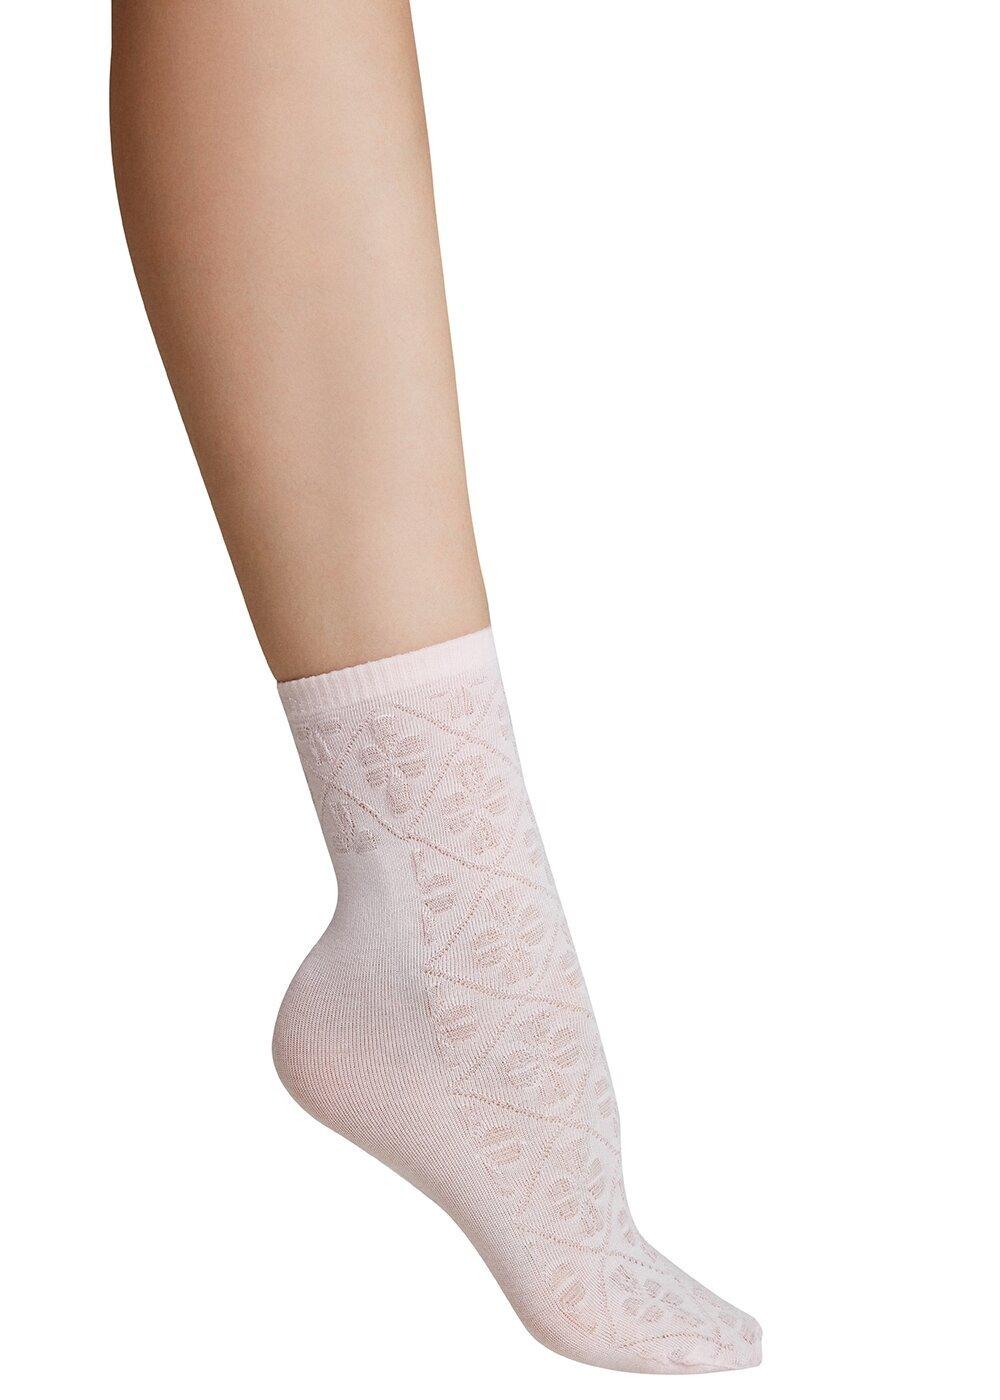 resm Ajur Soket Çorap - AÇIK PEMBE